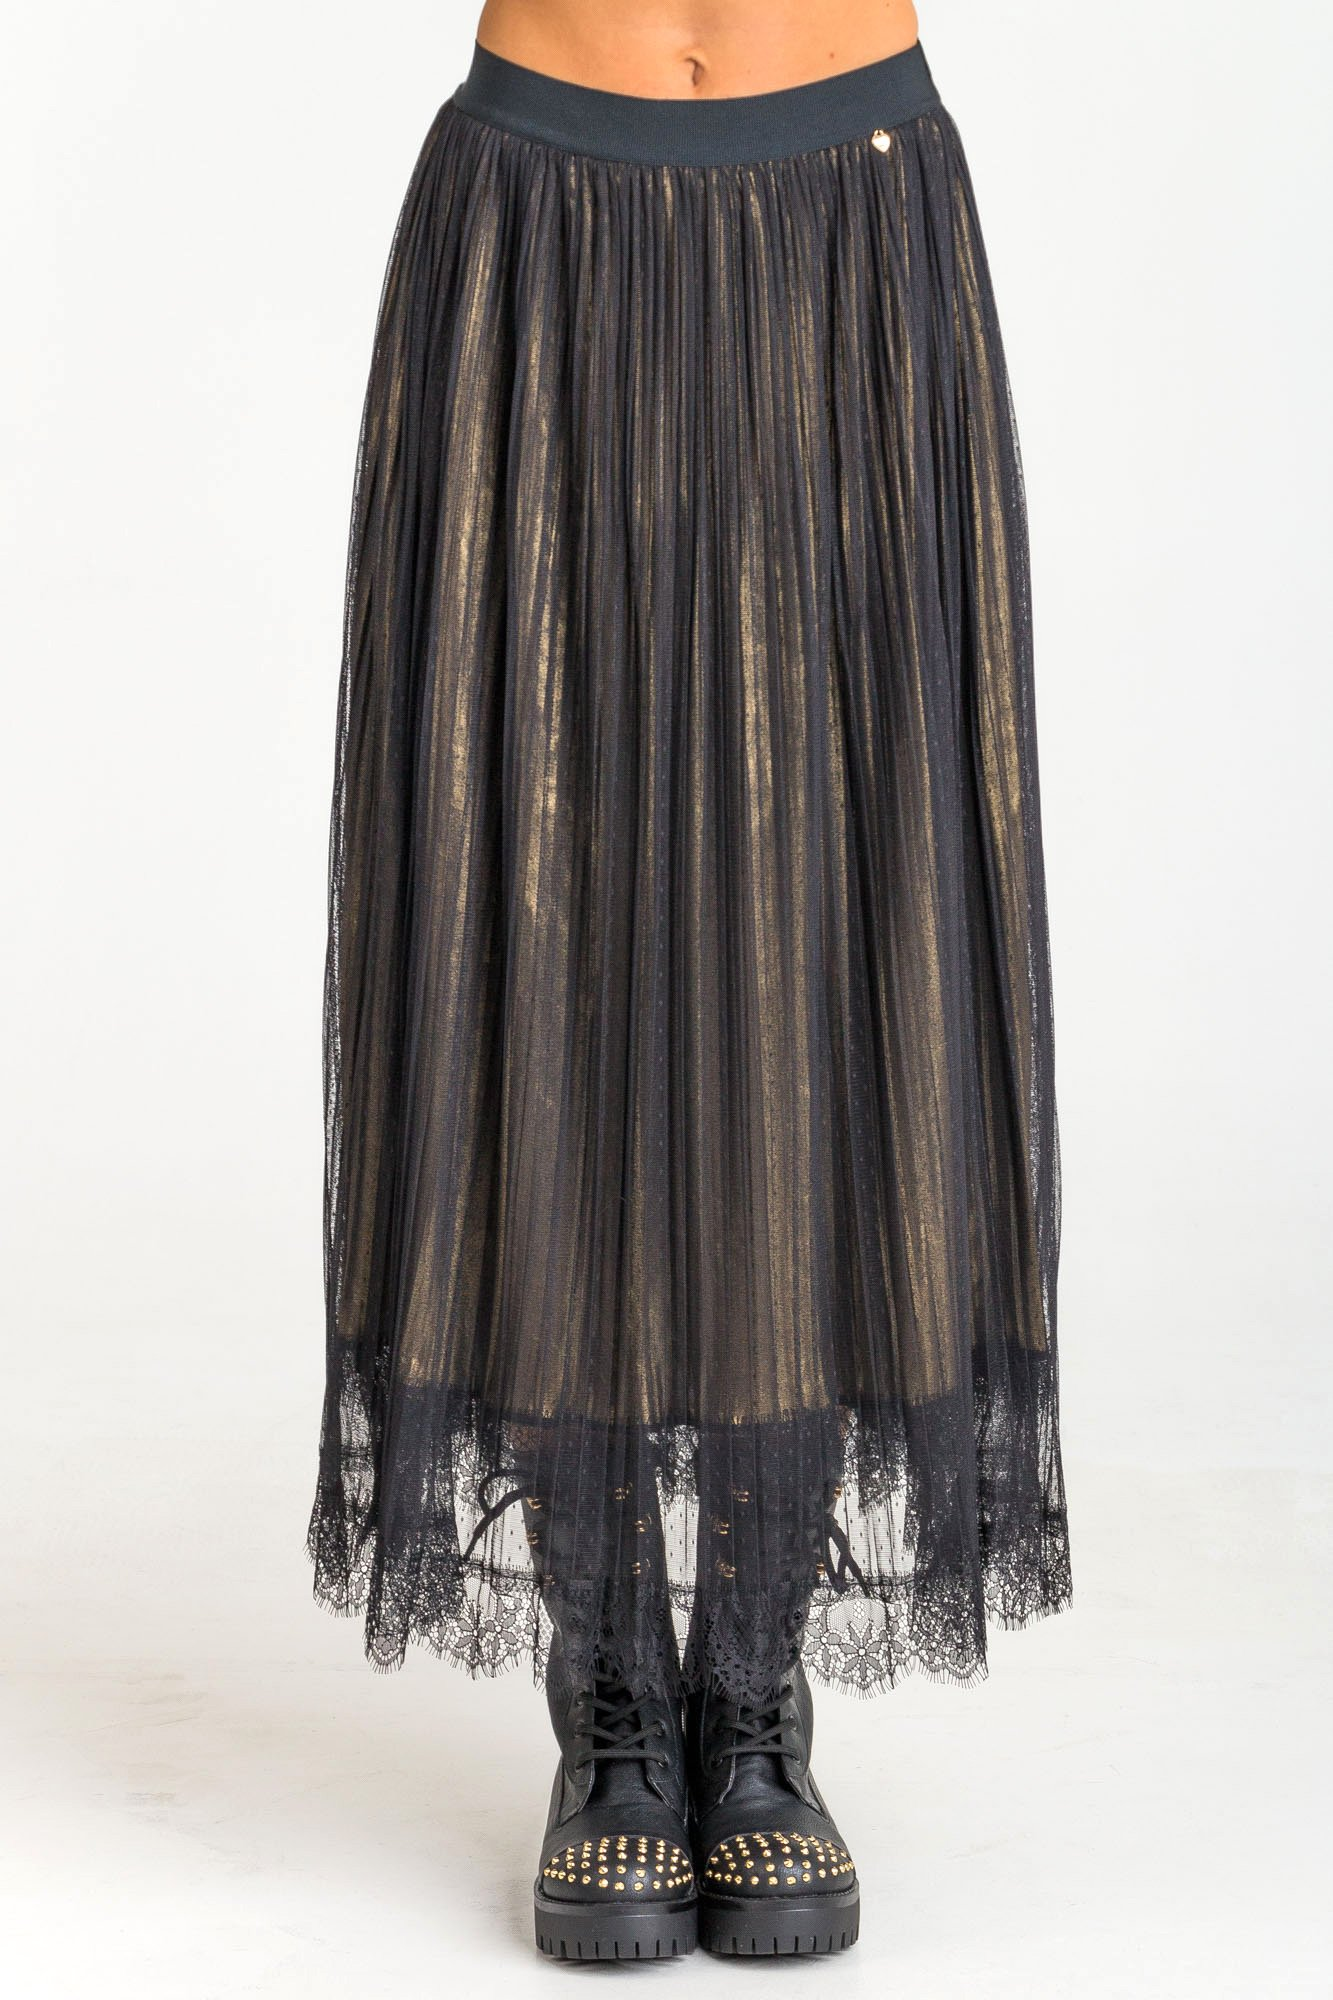 spódnica twinset – Thirty fashion